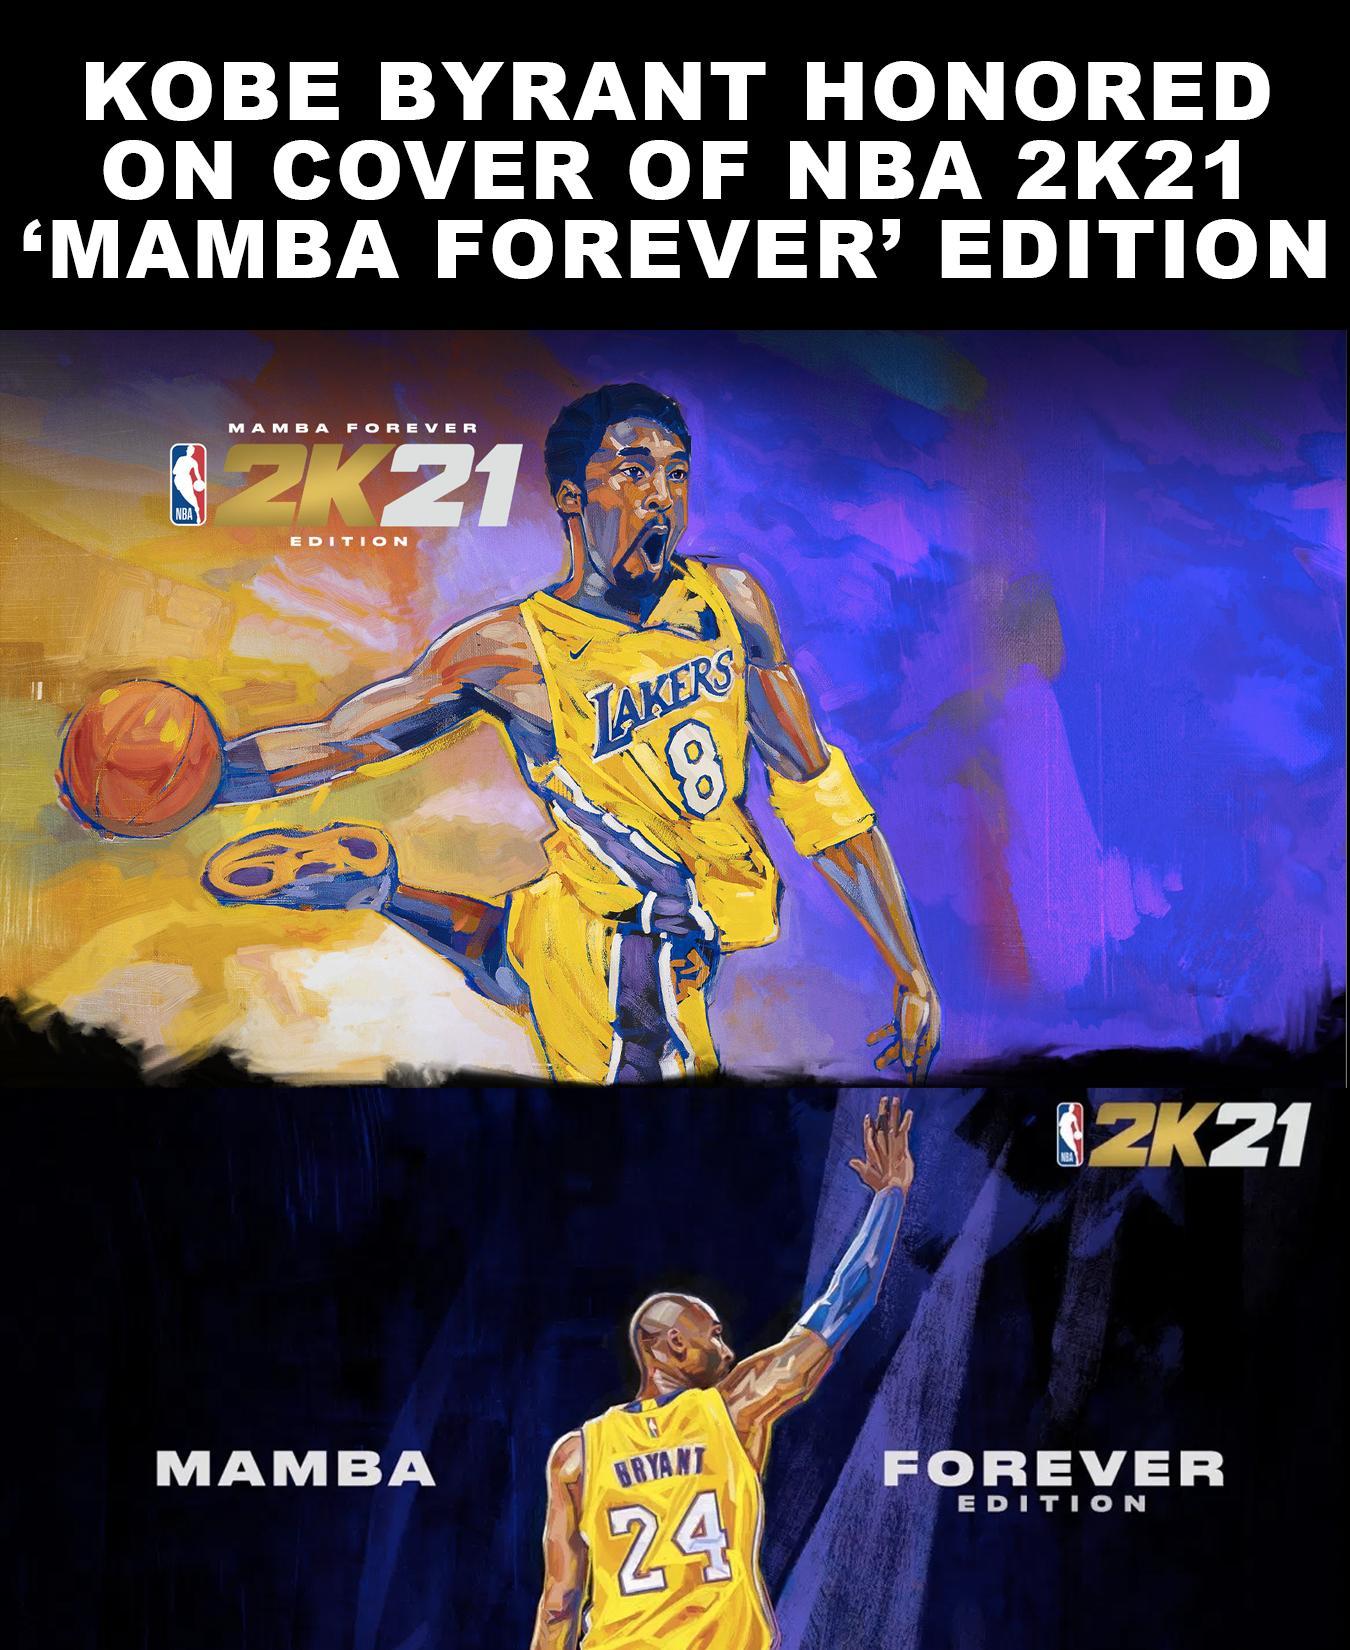 Kobe Bryant Honored On Nba 2k21 Cover Of Mamba Forever Edition In 2020 Kobe Nba Kobe Bryant